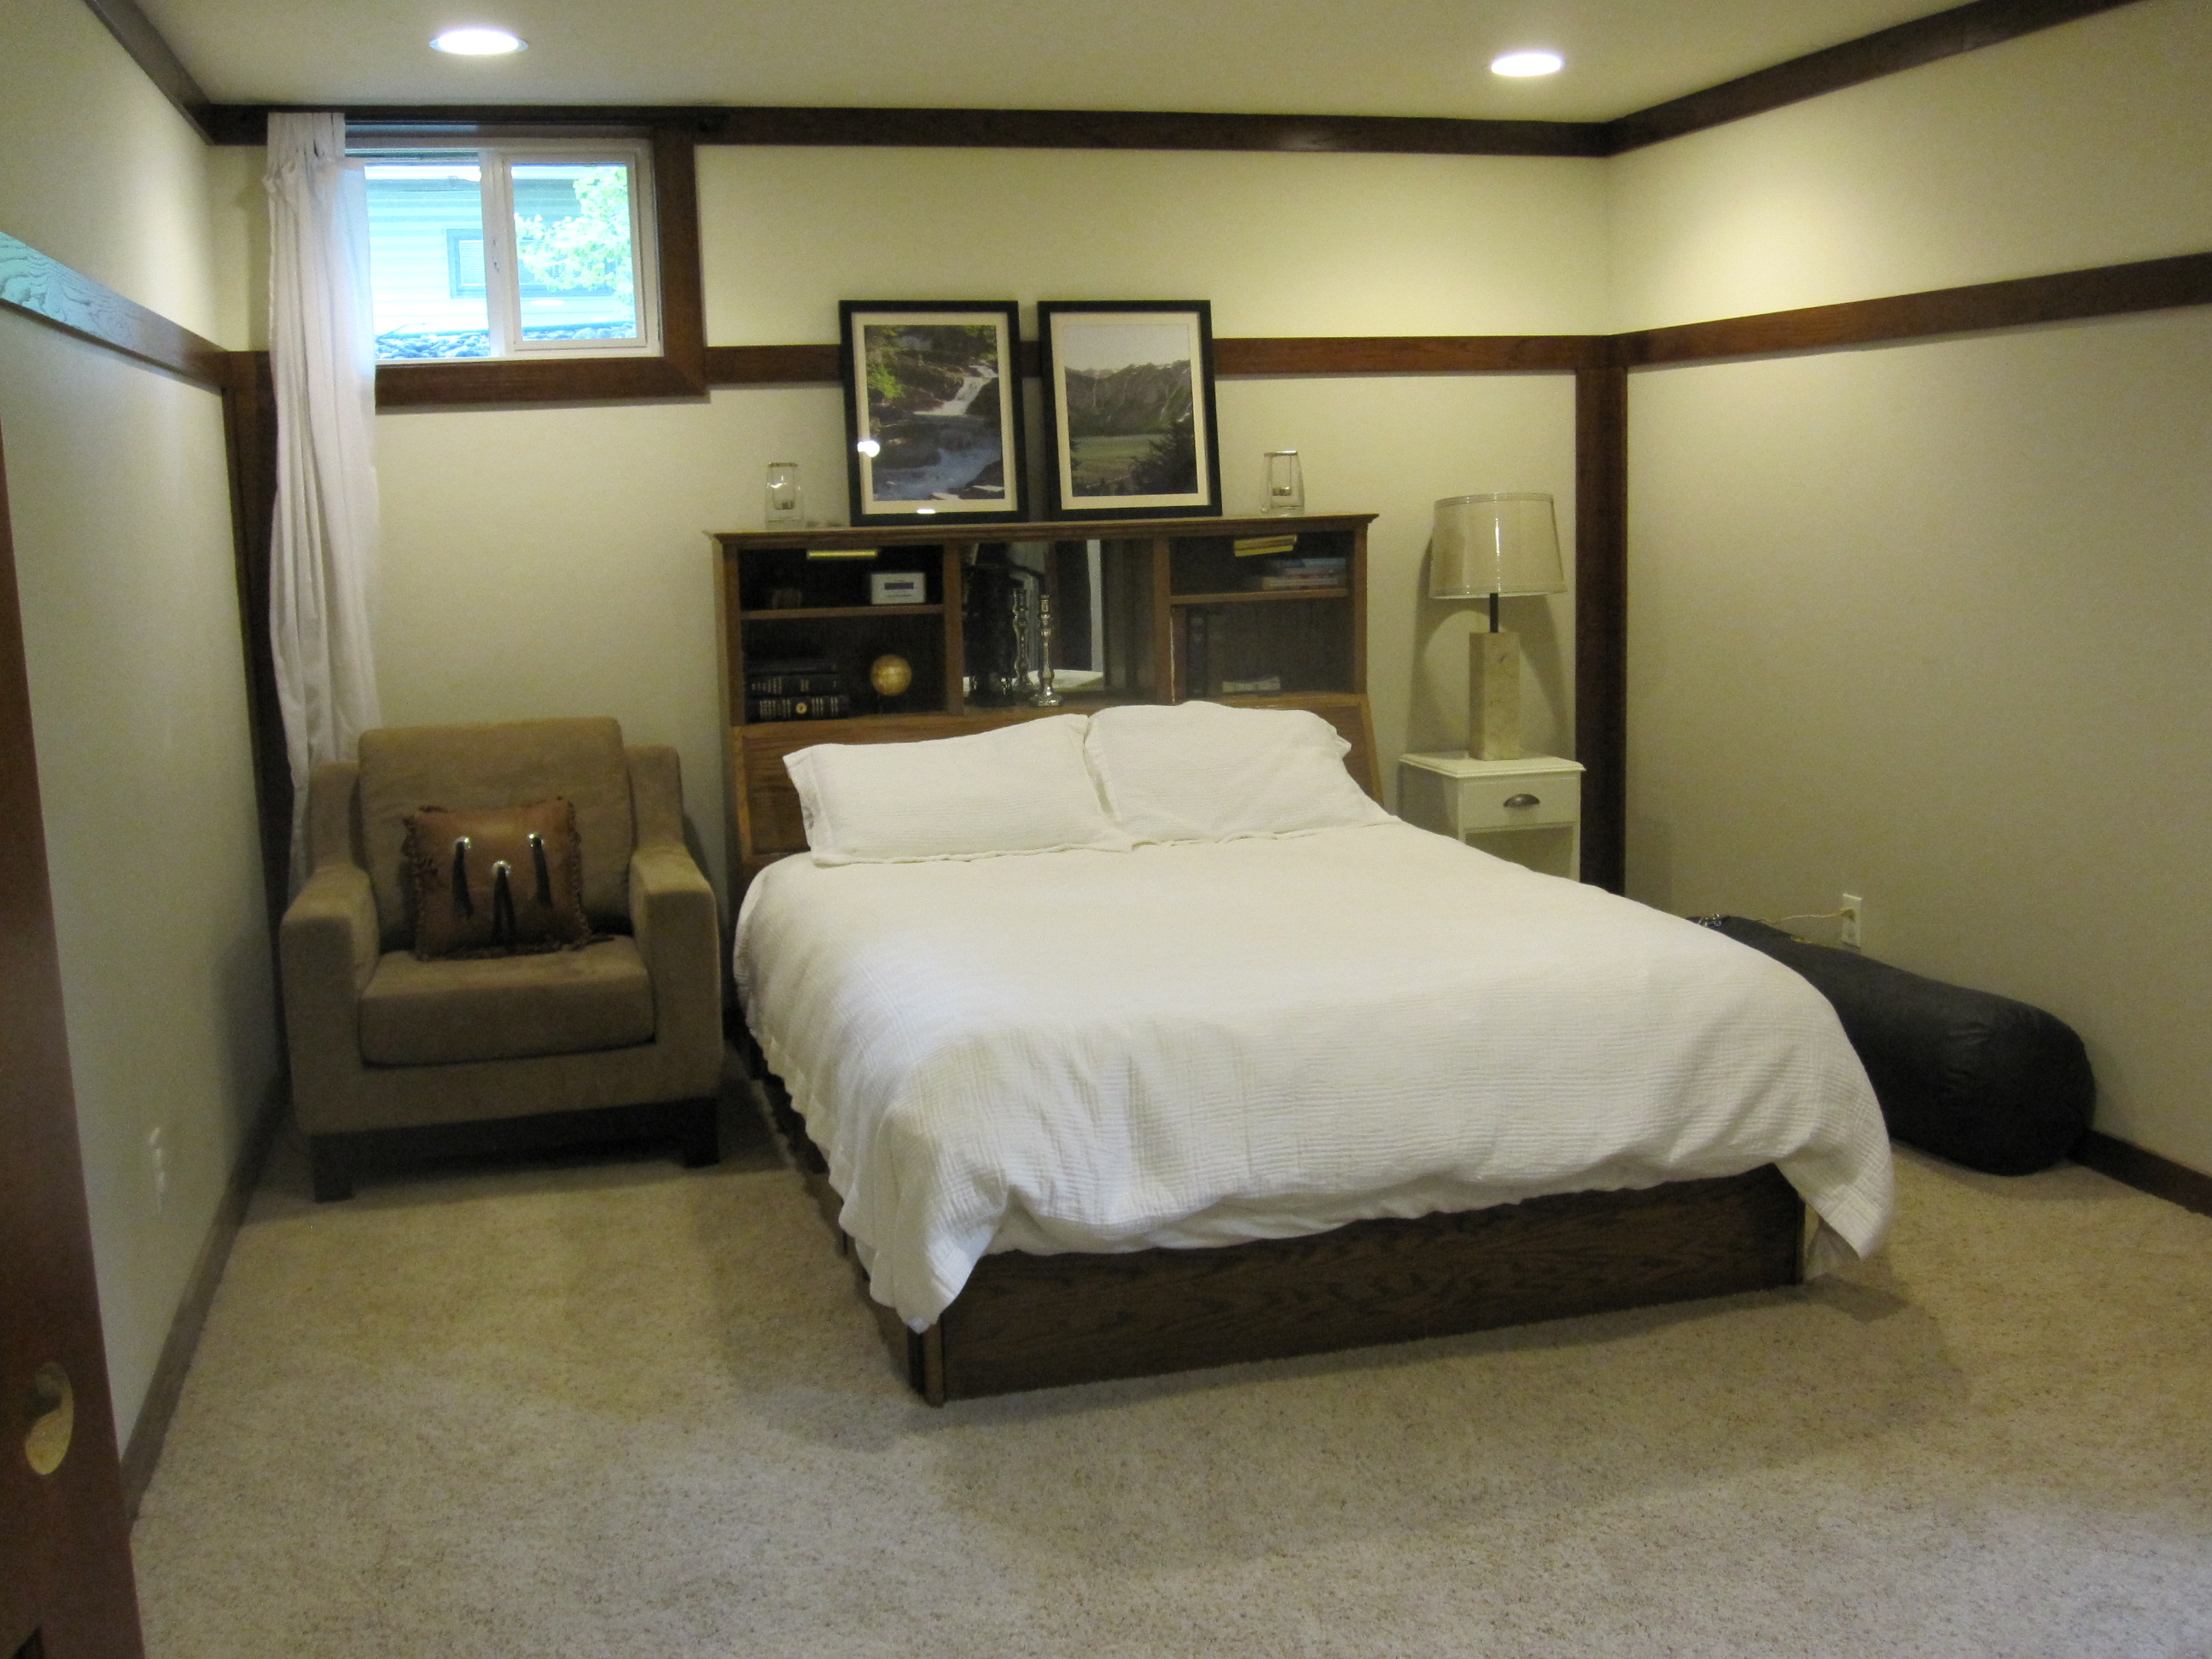 Basement Progress: Large Bedroom